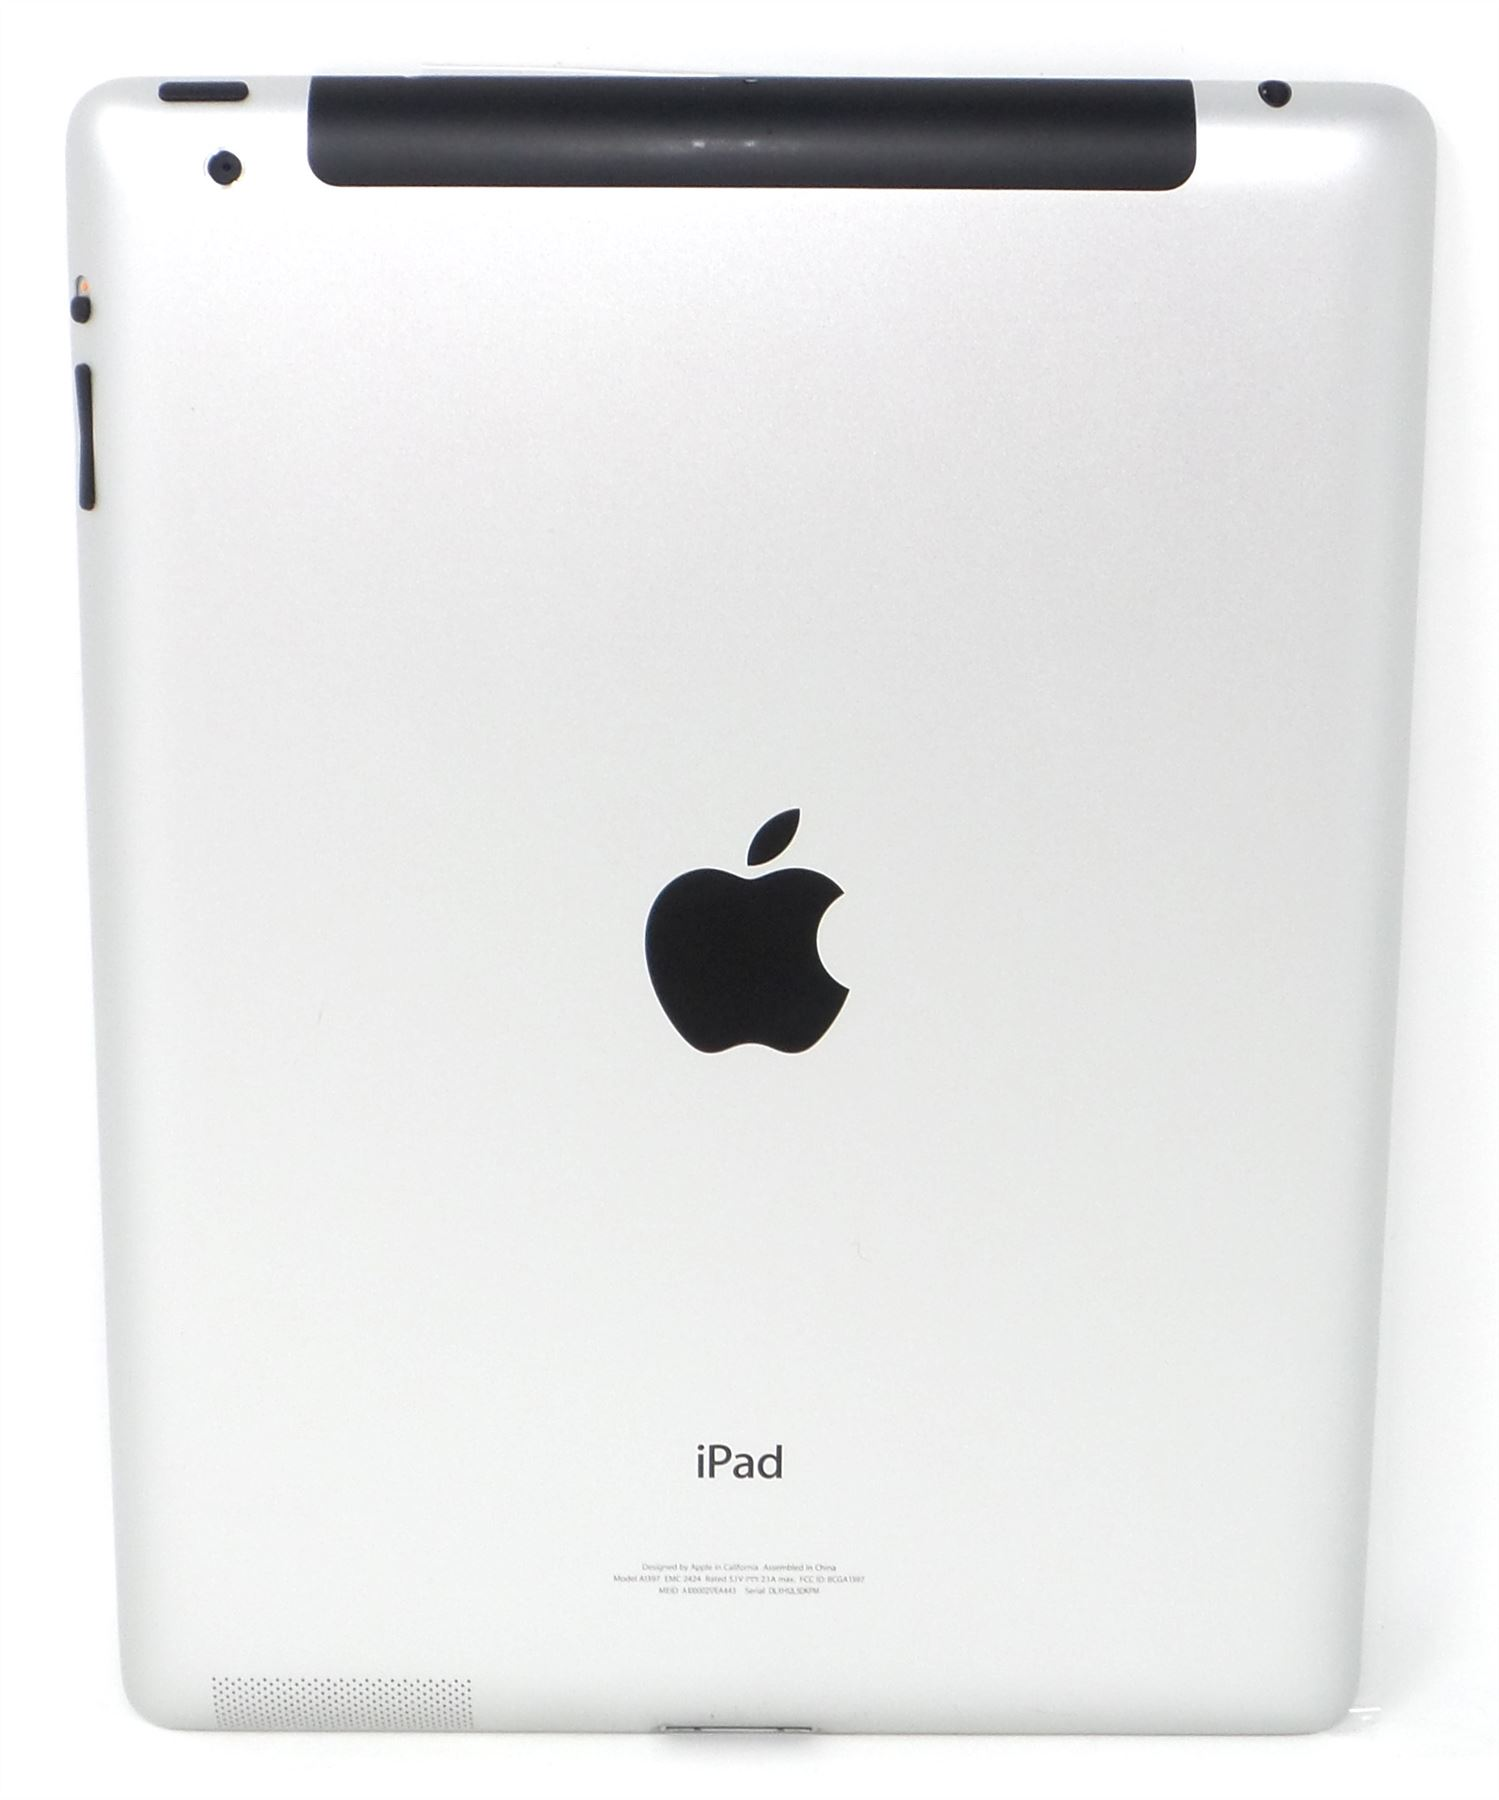 Apple-iPad-2nd-Gen-9-7-034-Wi-Fi-Cellular-16GB-32GB-64GB-128GB-Black-White-Bare thumbnail 9